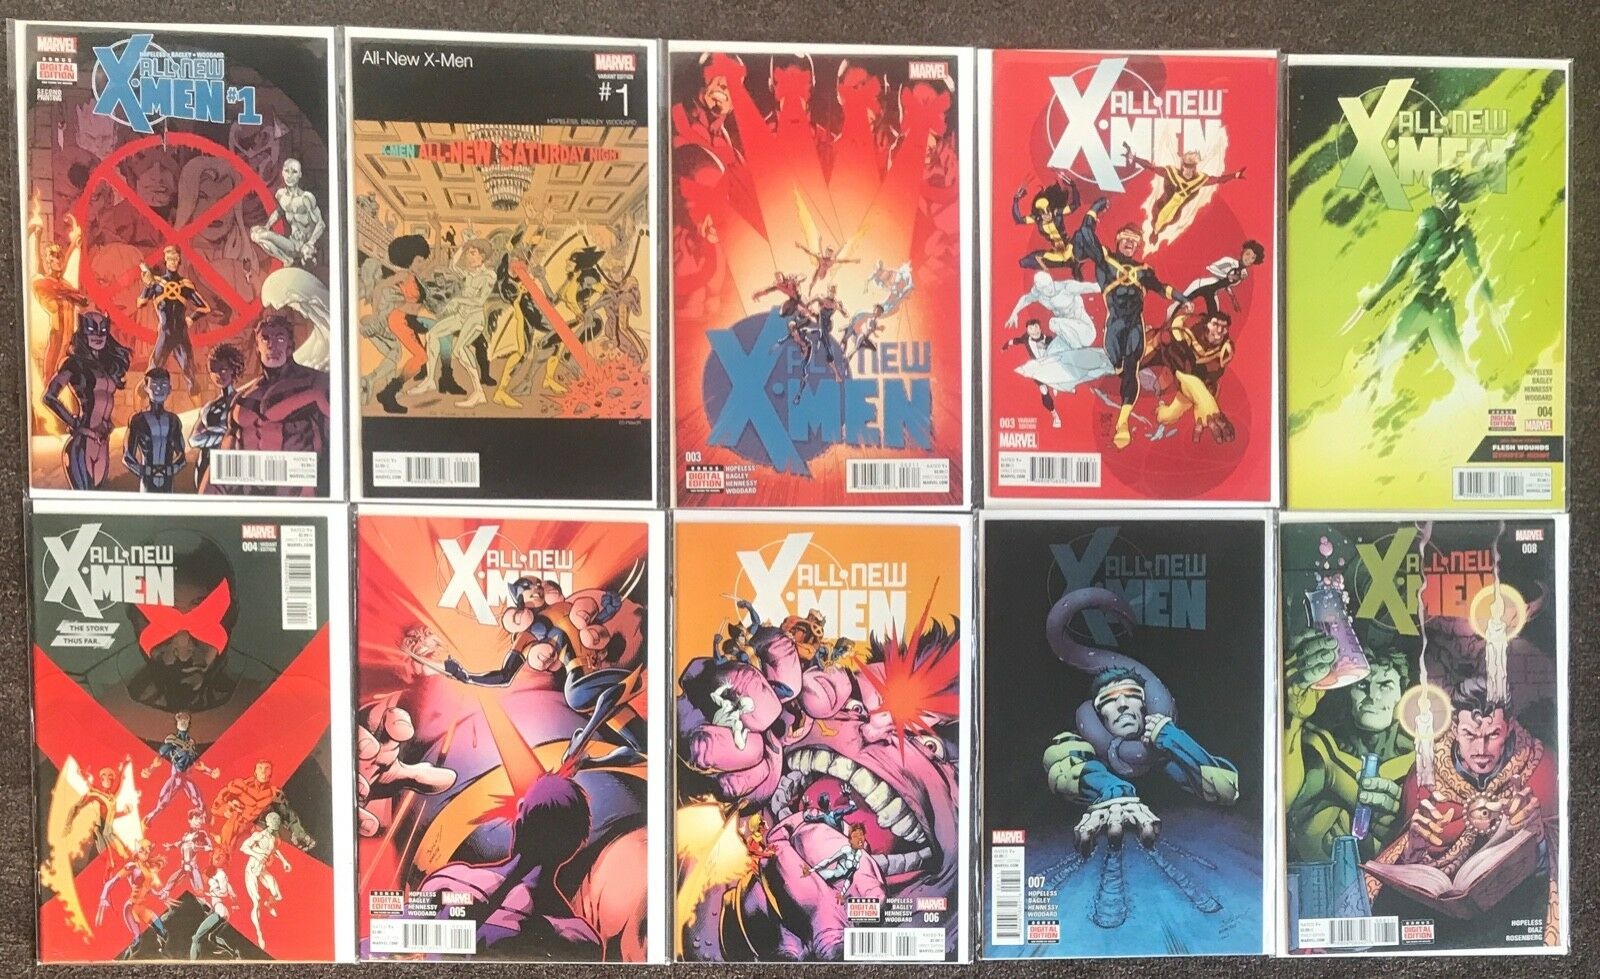 23 All New X-Men (Ser 2) 2) 2) variant lot nm b058c5